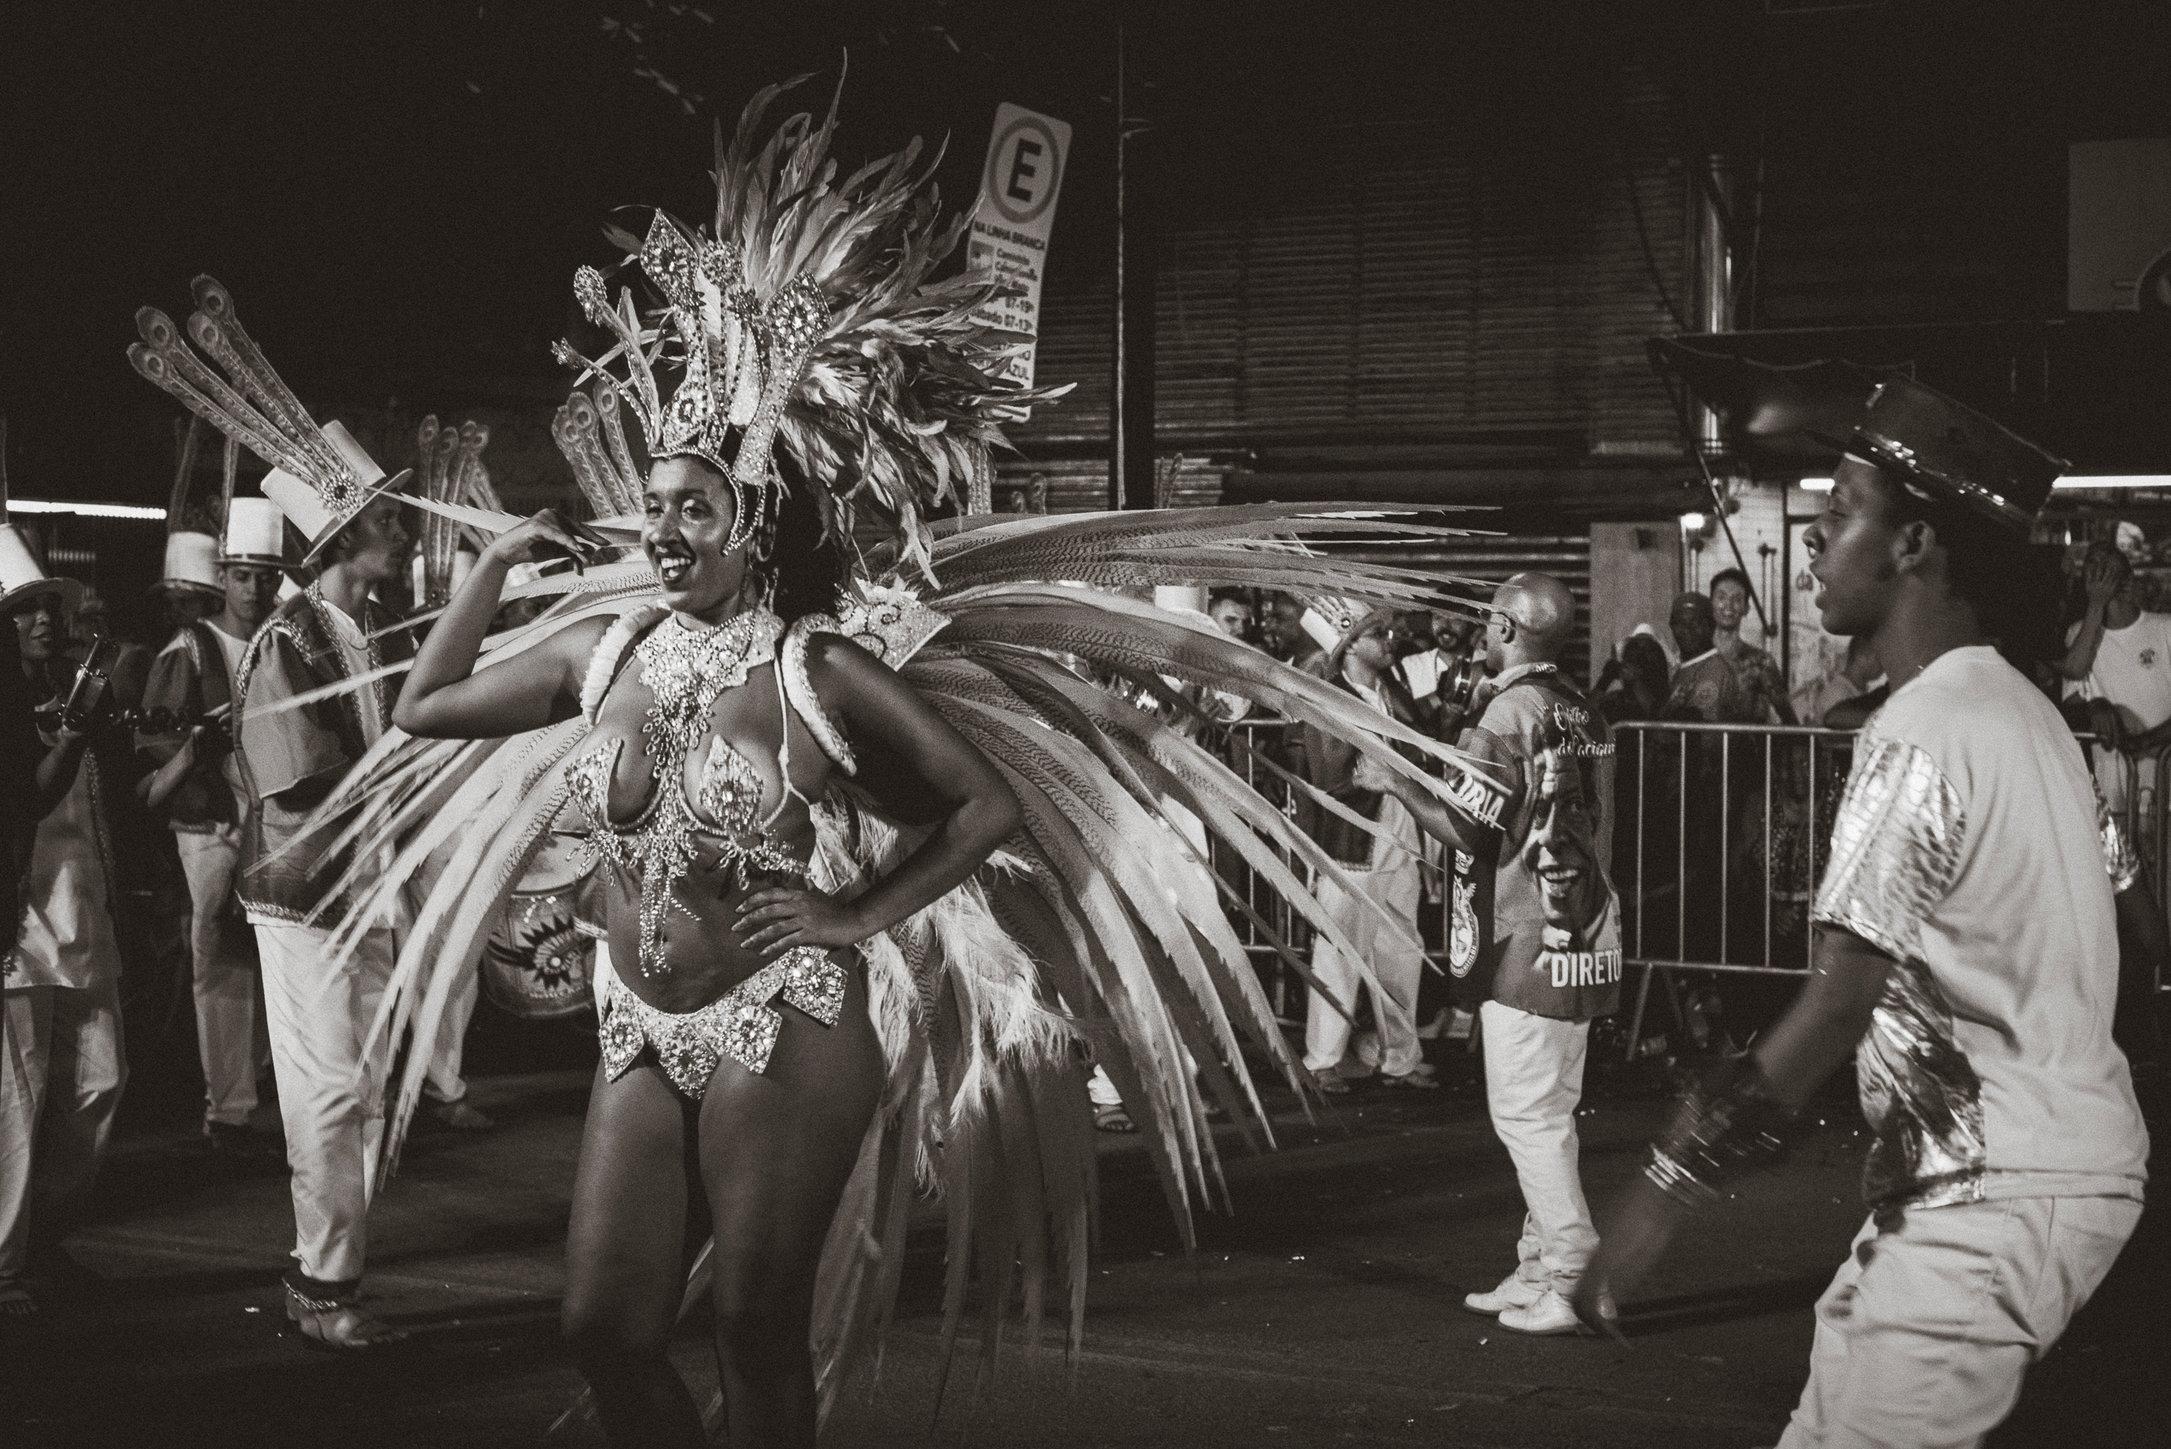 20180212-Carnaval-103.jpg